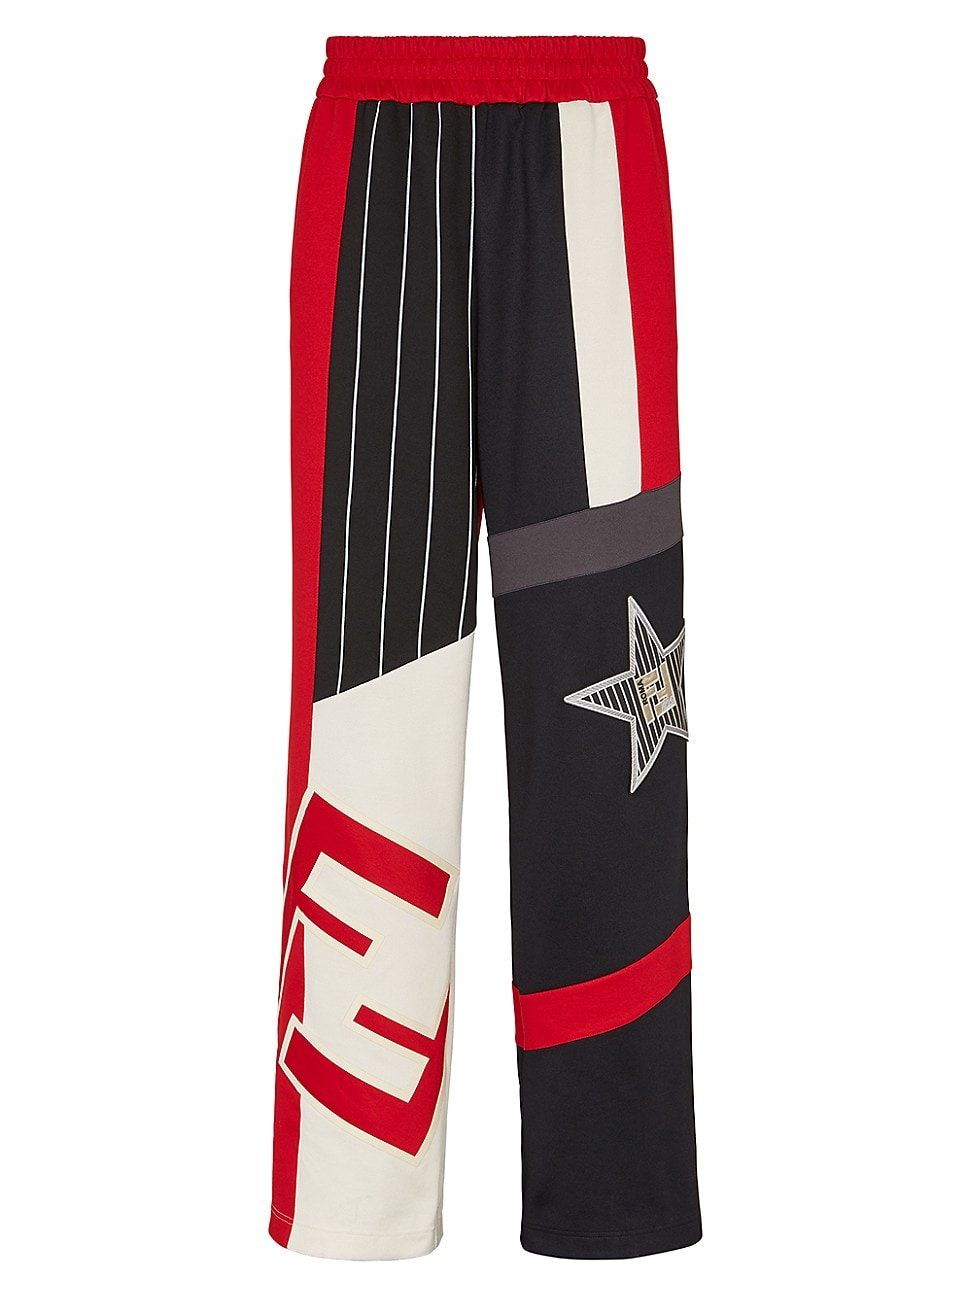 Fendi MEN'S FF ACTIVE STAR TRACK PANTS